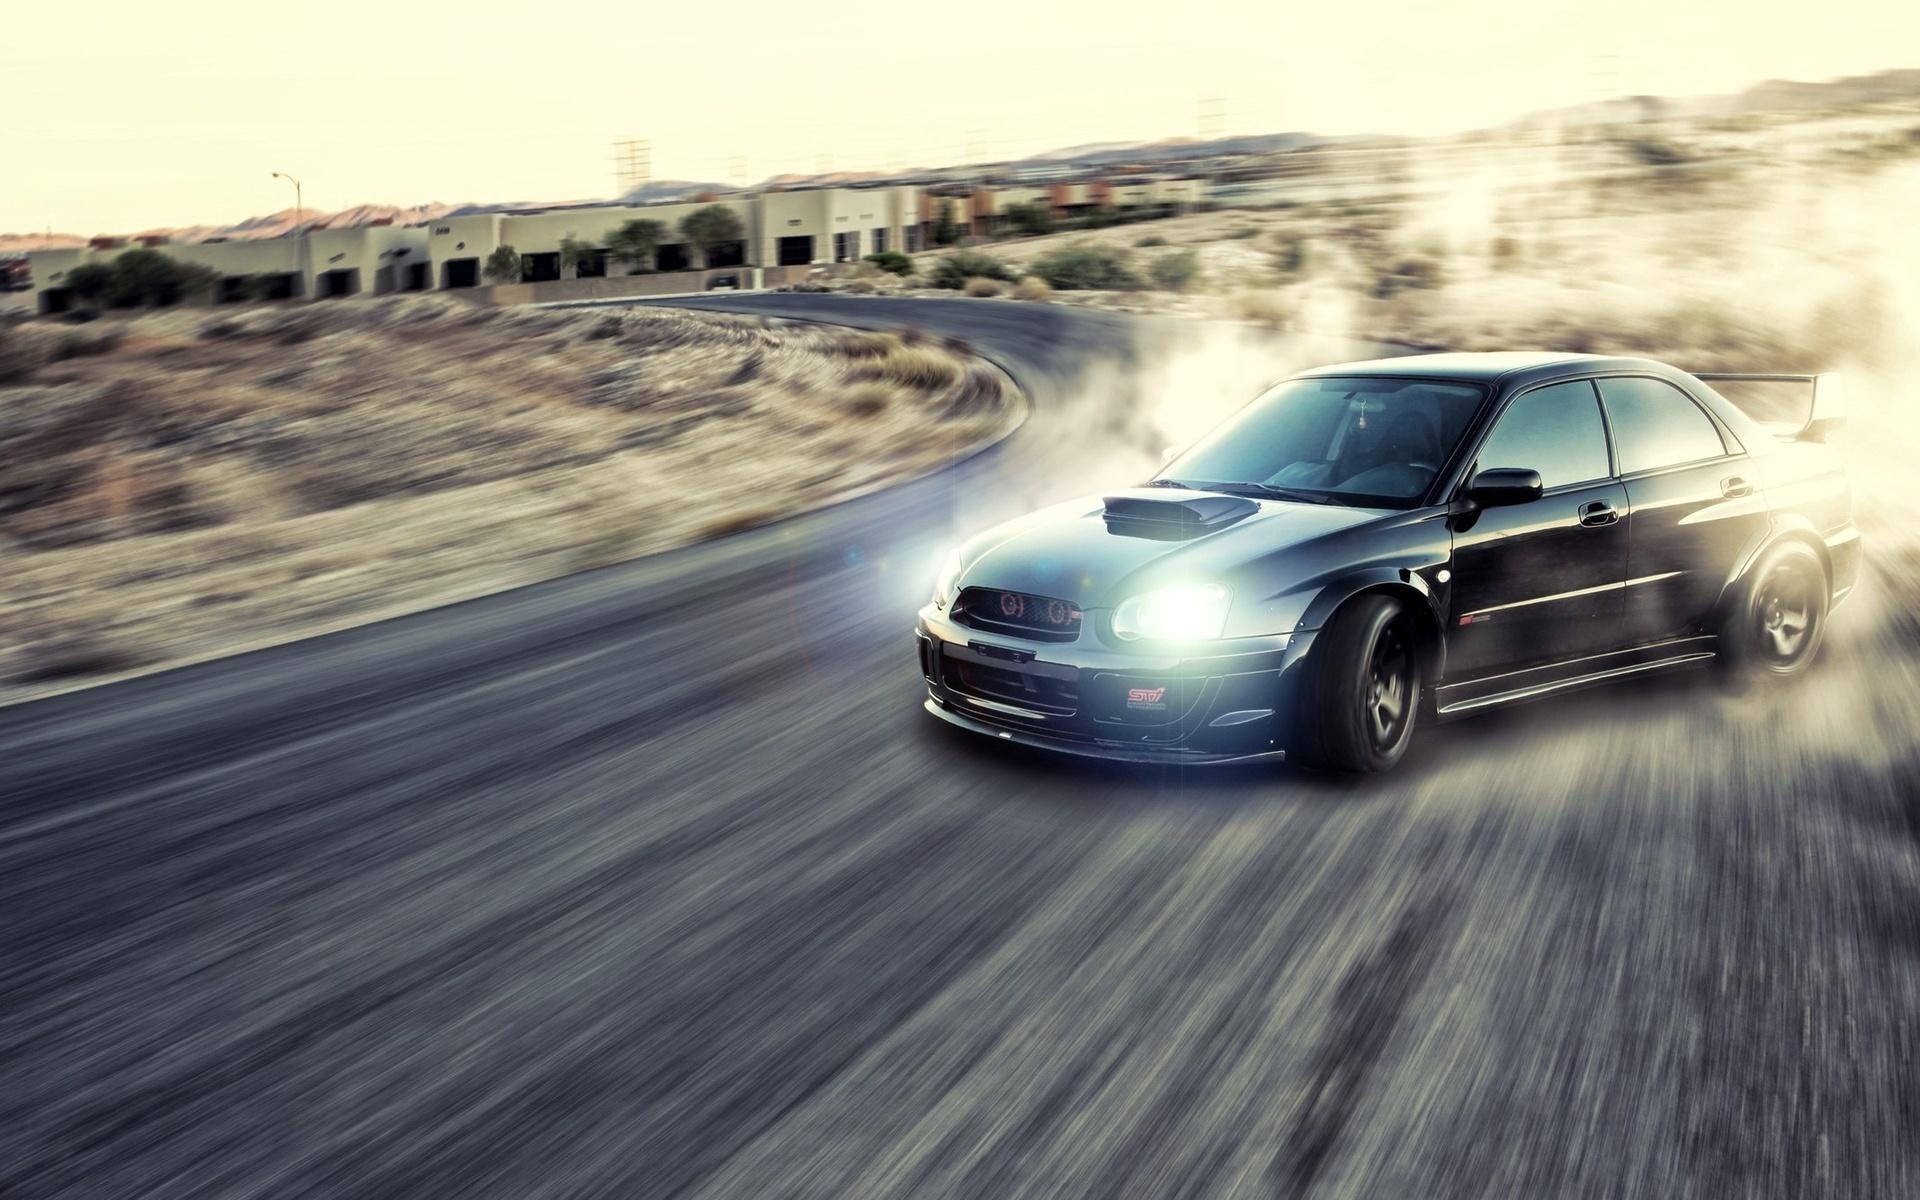 Download mobile wallpaper Art Photo, Subaru, Auto, Transport for free.